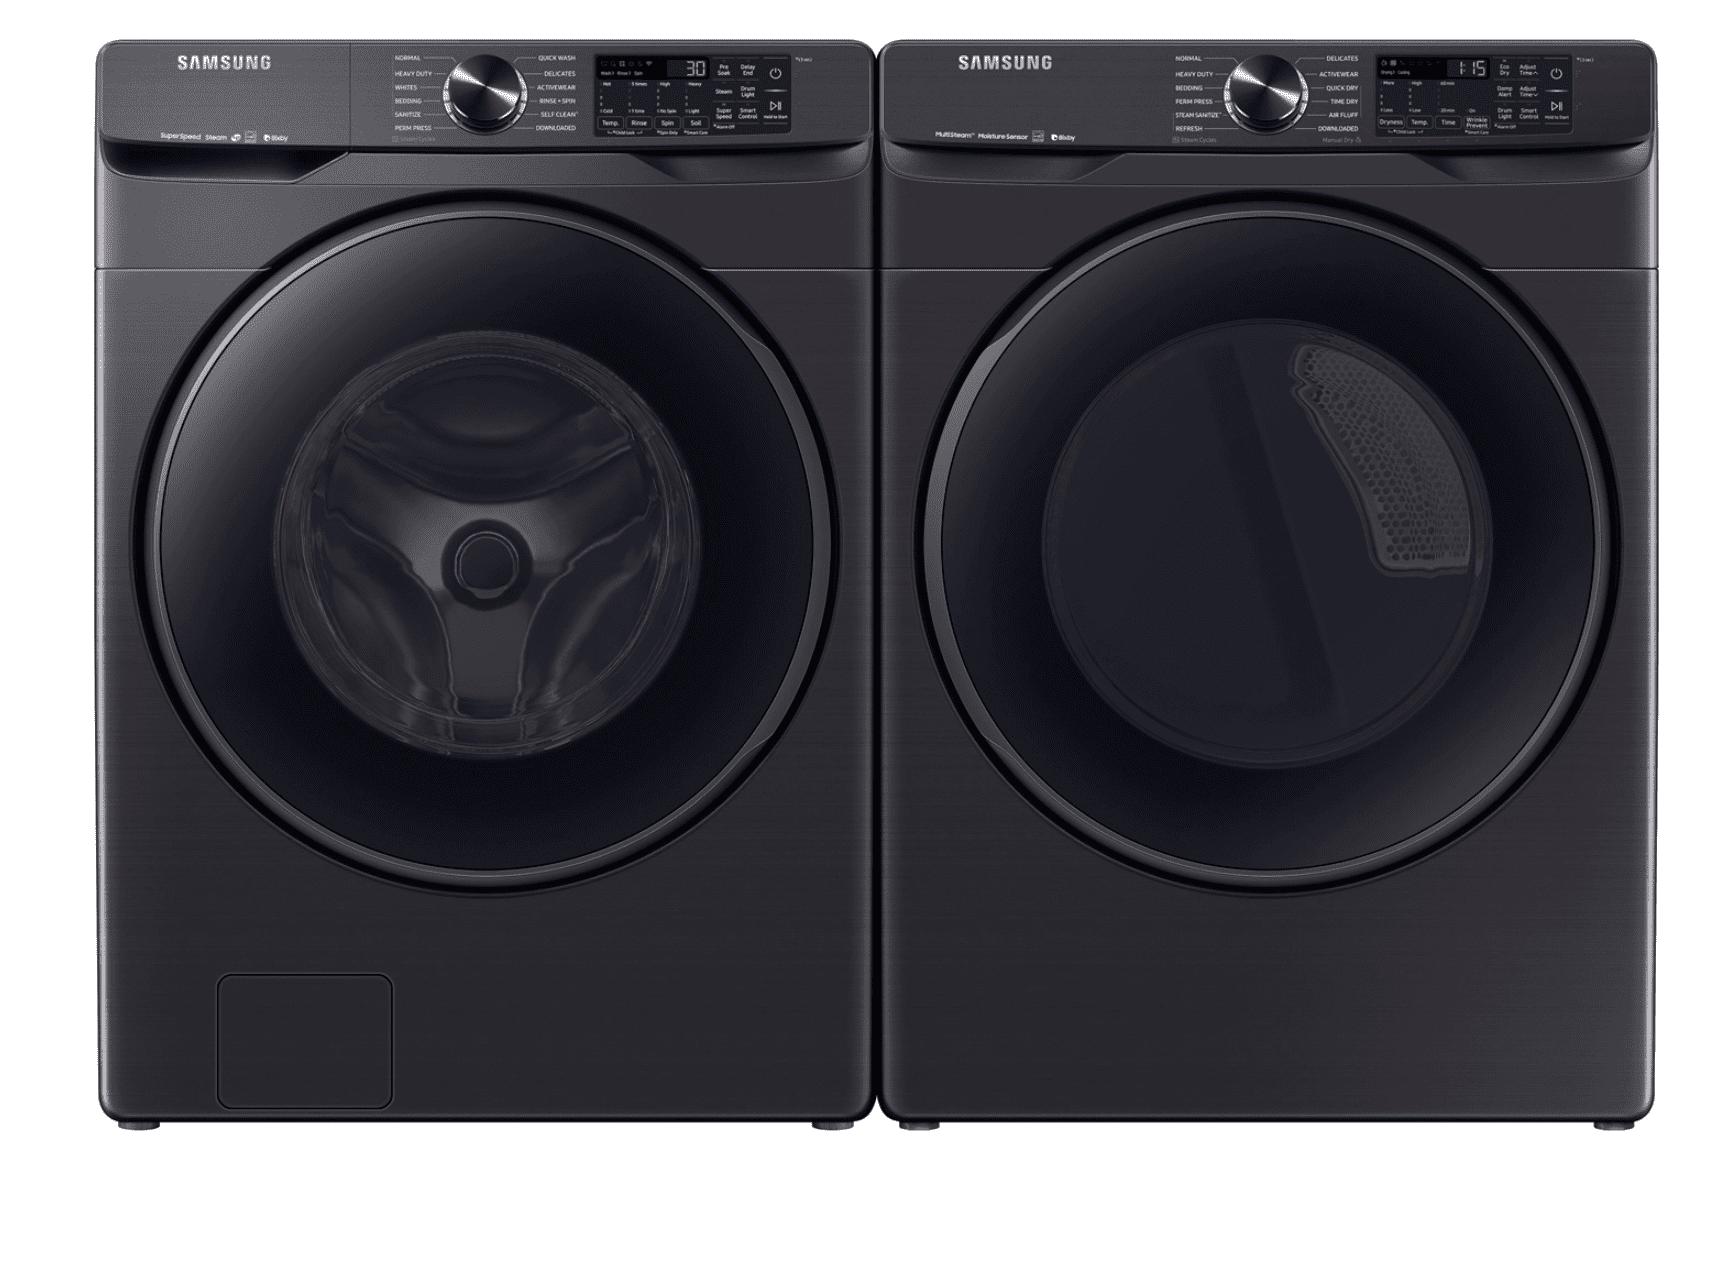 Samsung WF50R8500AV & DVE50R8500V